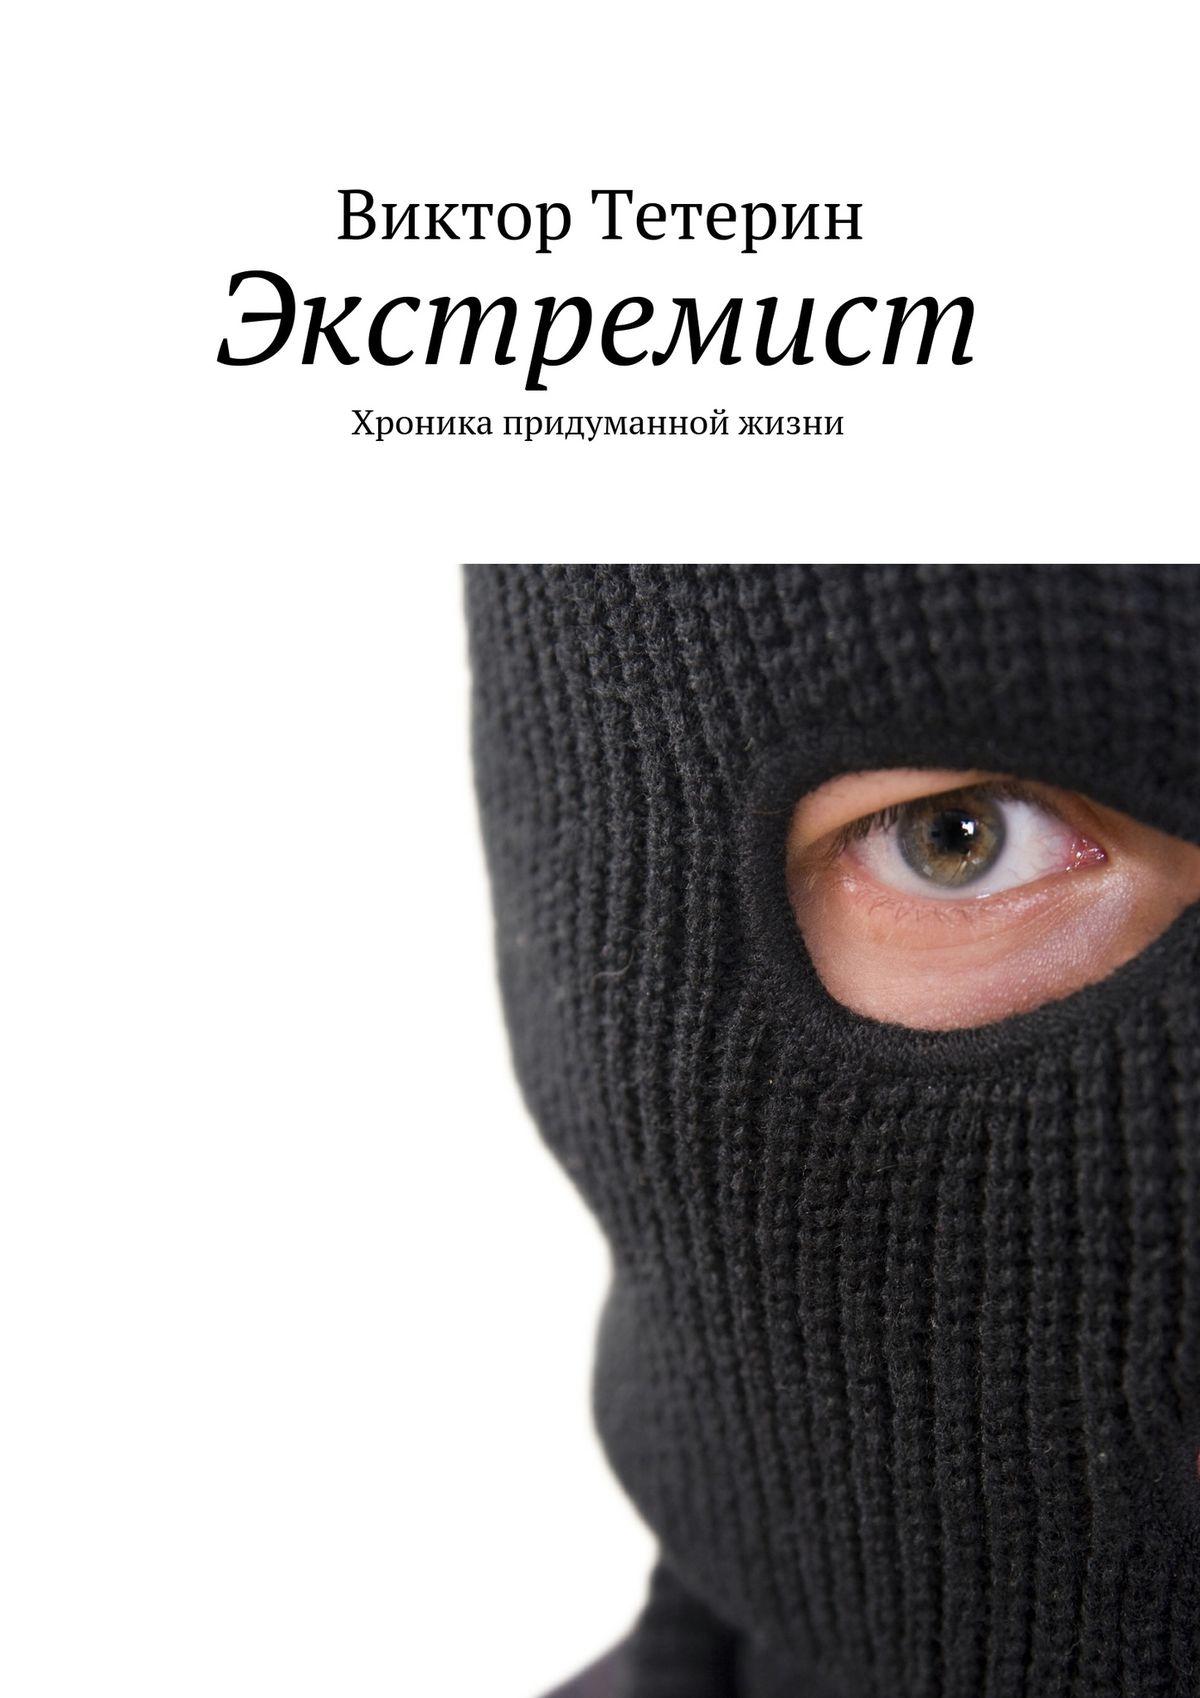 Виктор Тетерин Экстремист. Хроника придуманной жизни